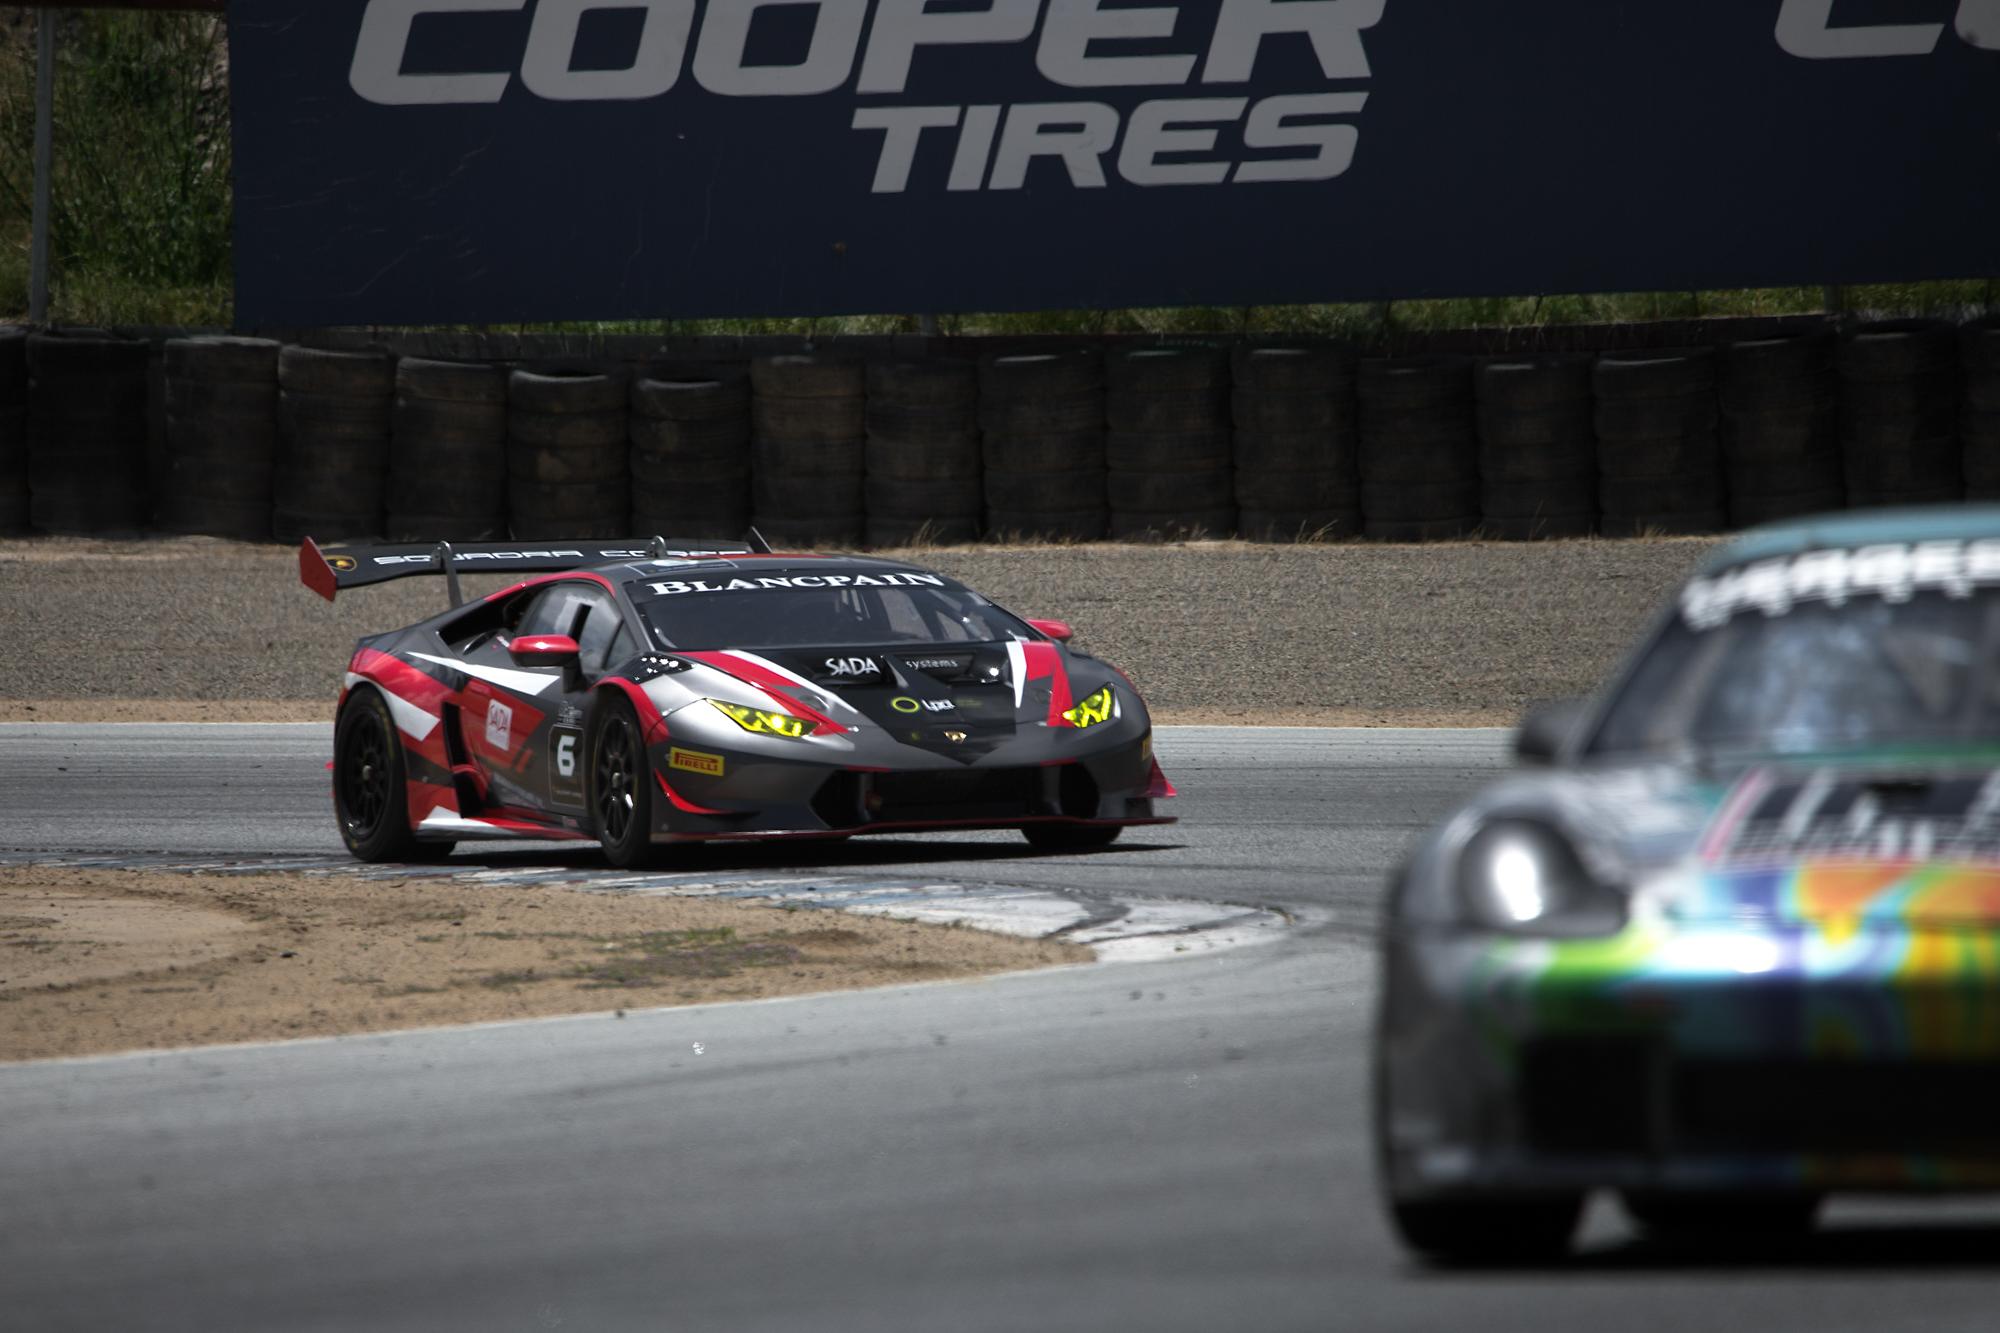 Steven-Racing-Laguna-20180531-96194.jpg